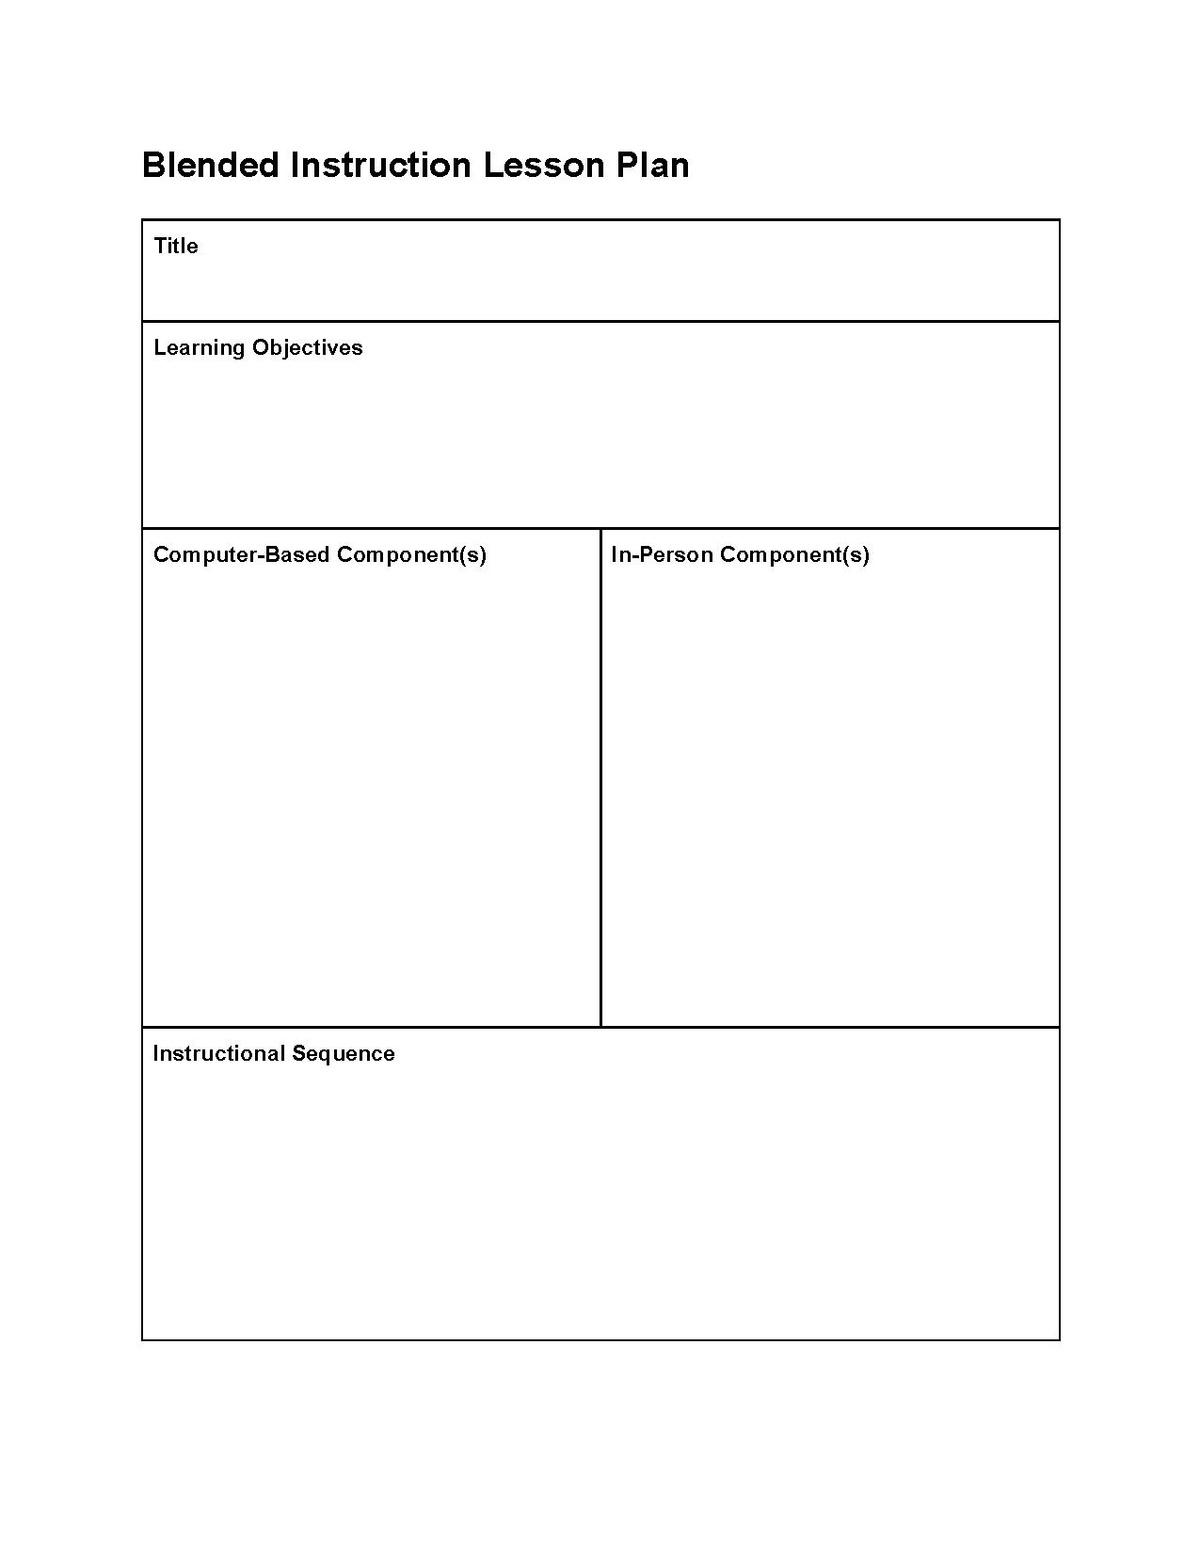 Instructional Design Blended Learning Lesson Plans